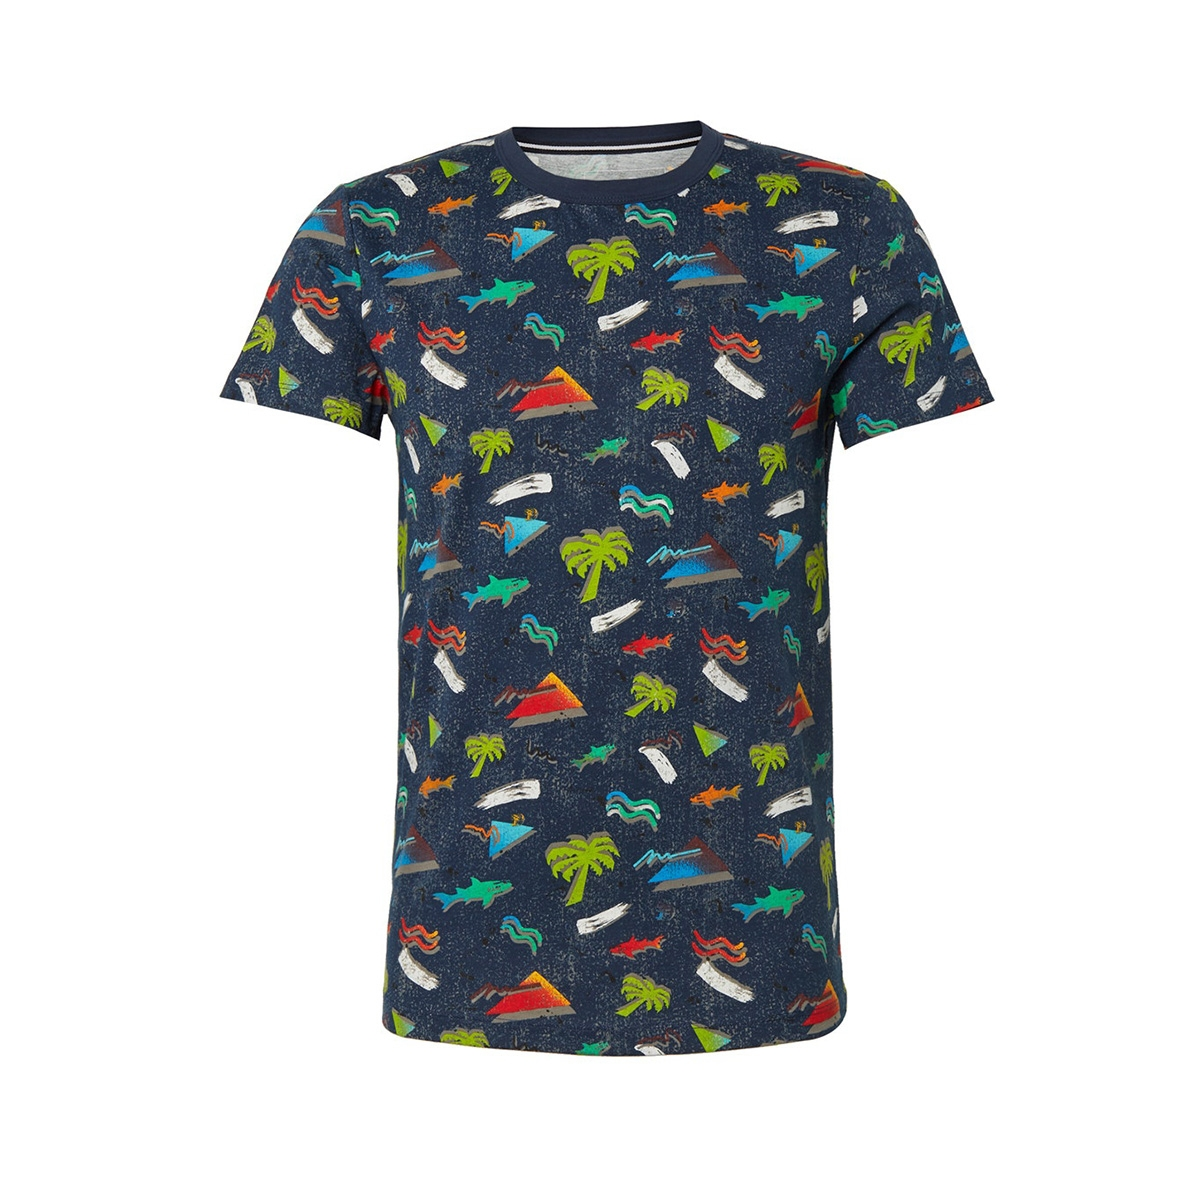 t shirt met all over print 1011386xx12 tom tailor t-shirt 18294